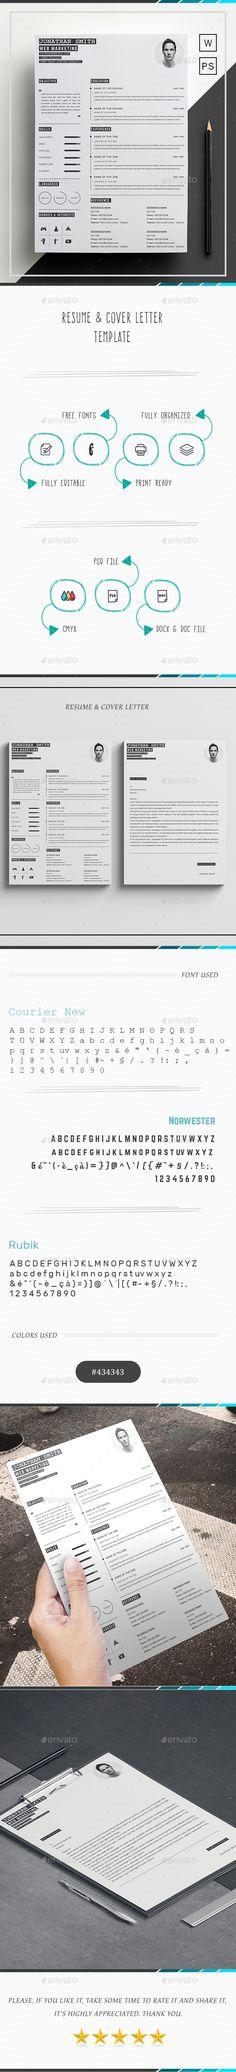 Resume Infographic resume Font logo